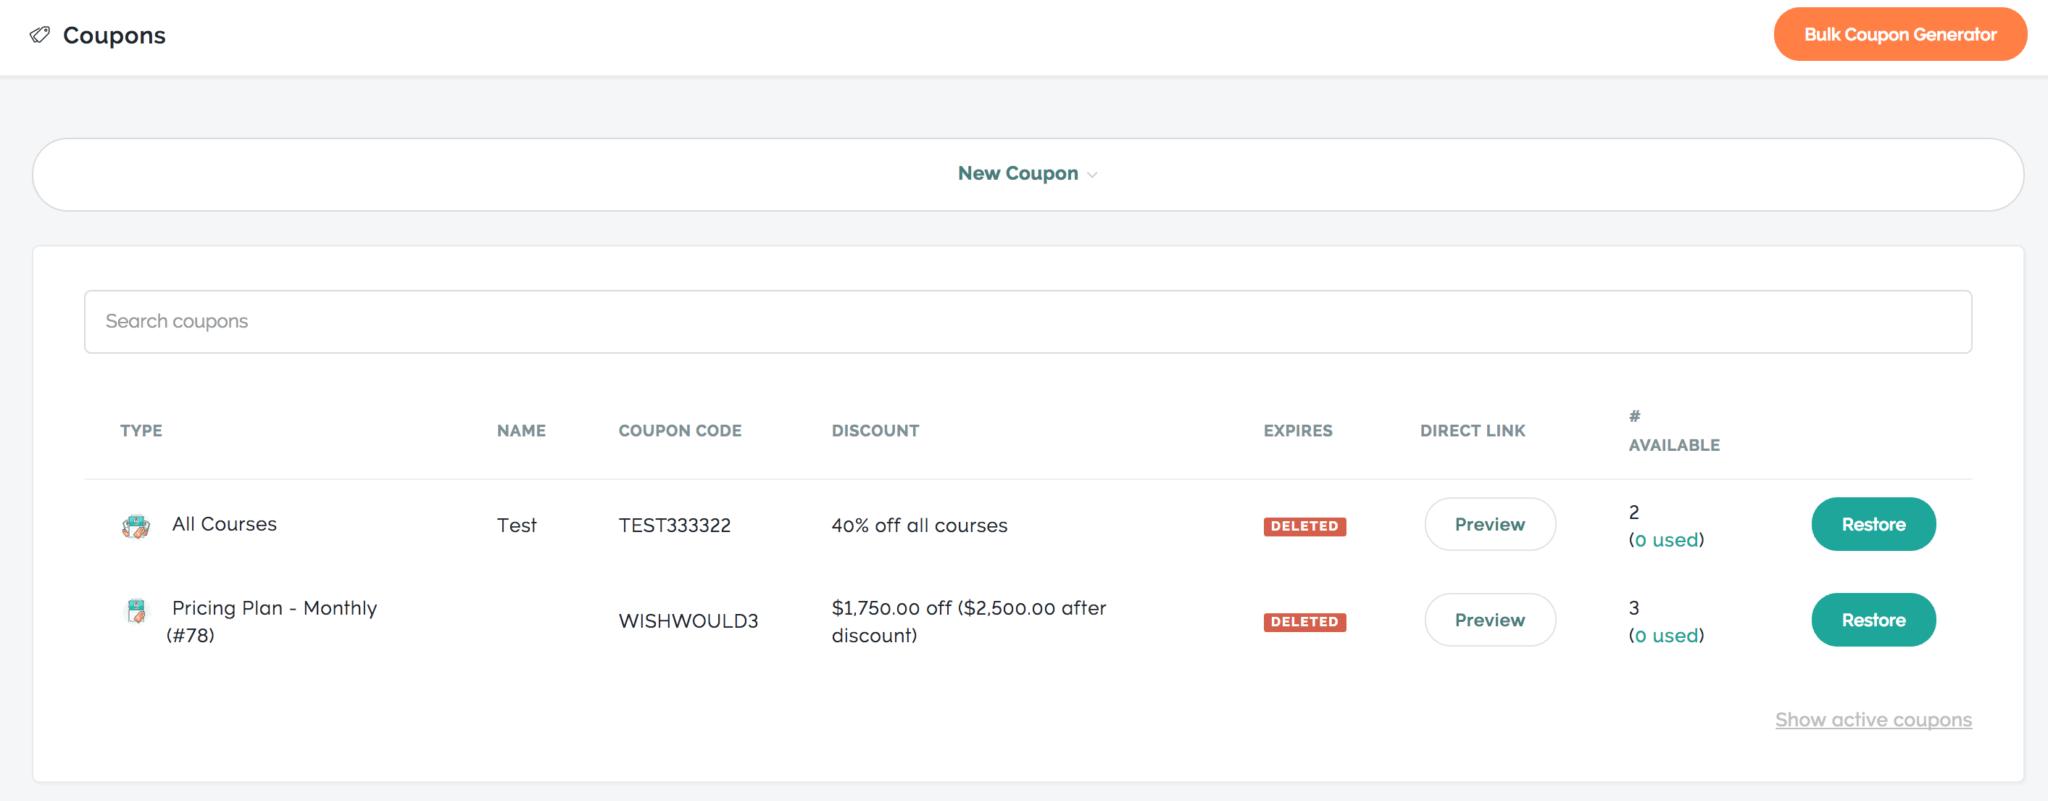 Coupon Spreadsheet App free templates download